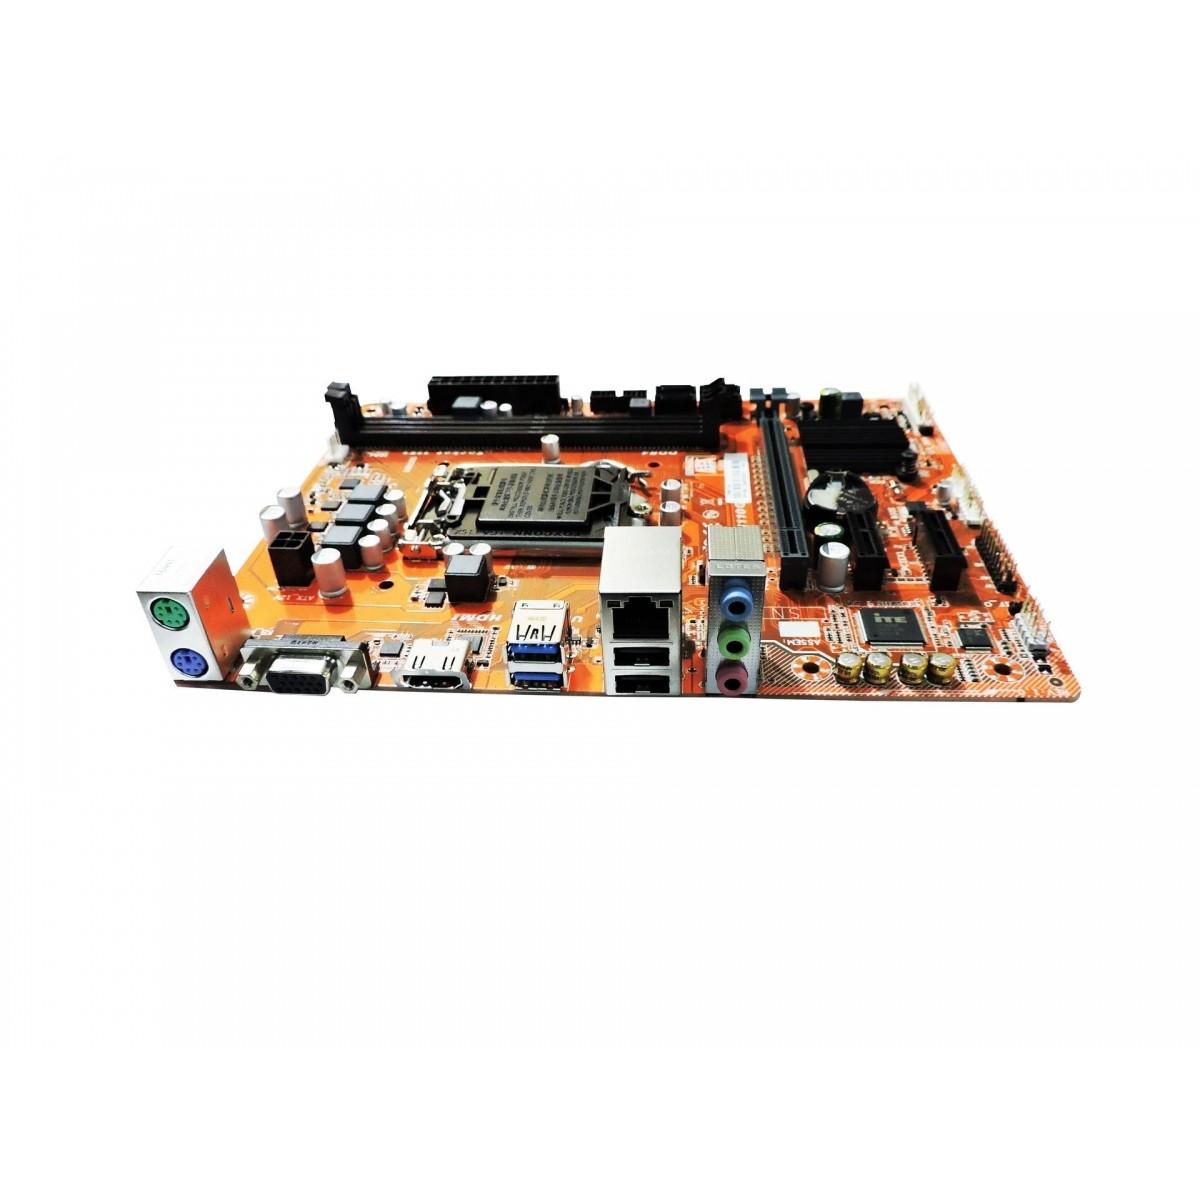 Placa Mae 1151 Pcware Ddr4 Ipmh110G Hdmi| Vga